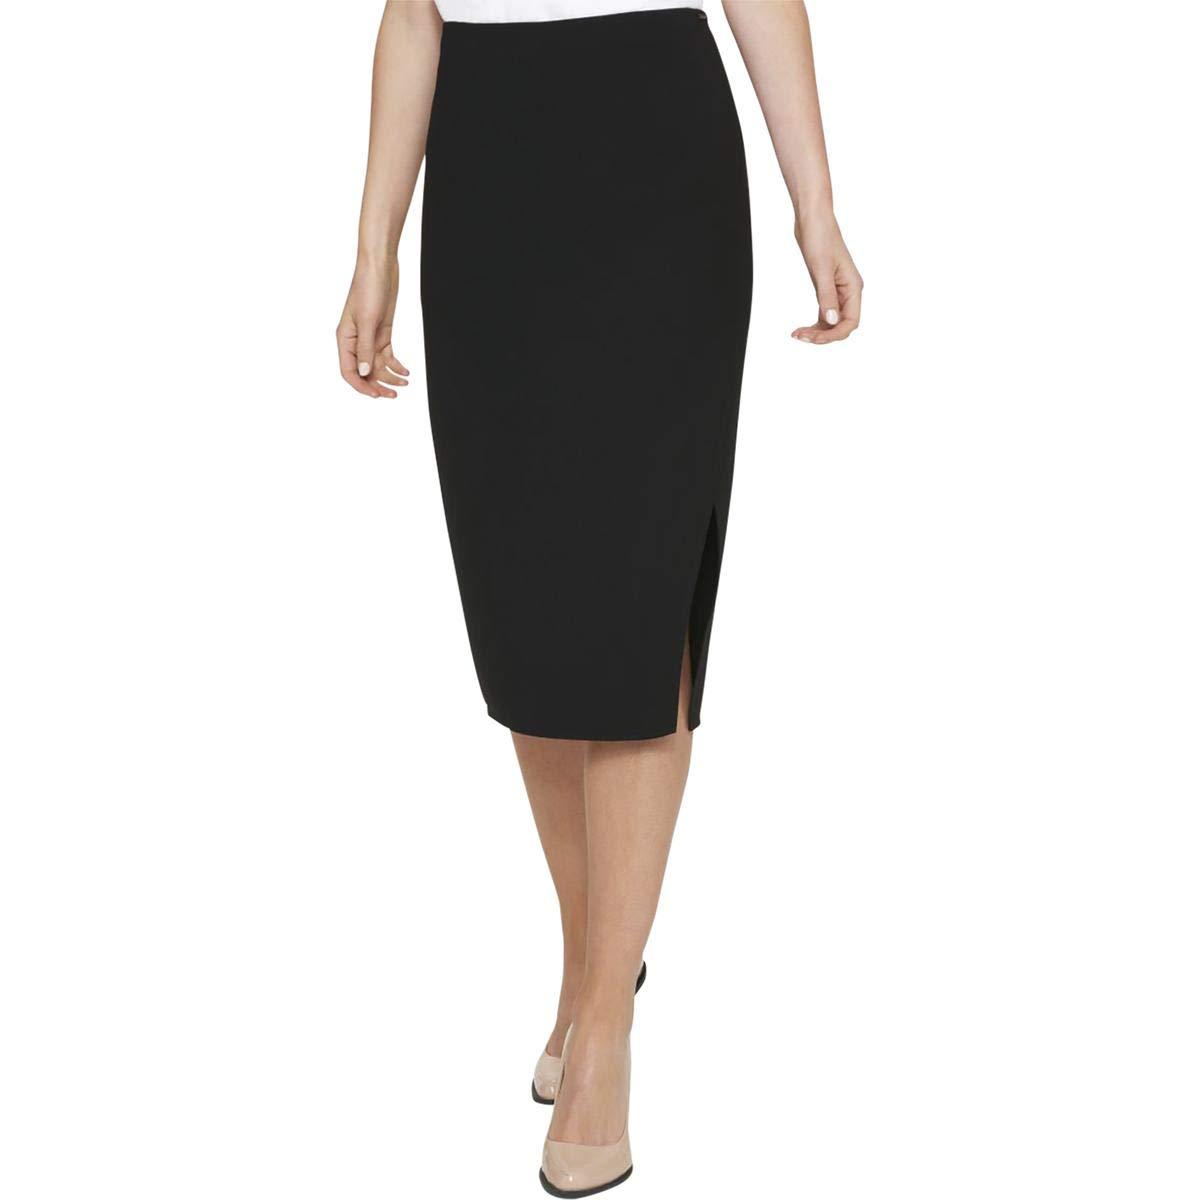 7d34bf8d204e3 Amazon.com  DKNY Womens Crossover Front Knee Straight Pencil Skirt Blacks   Clothing